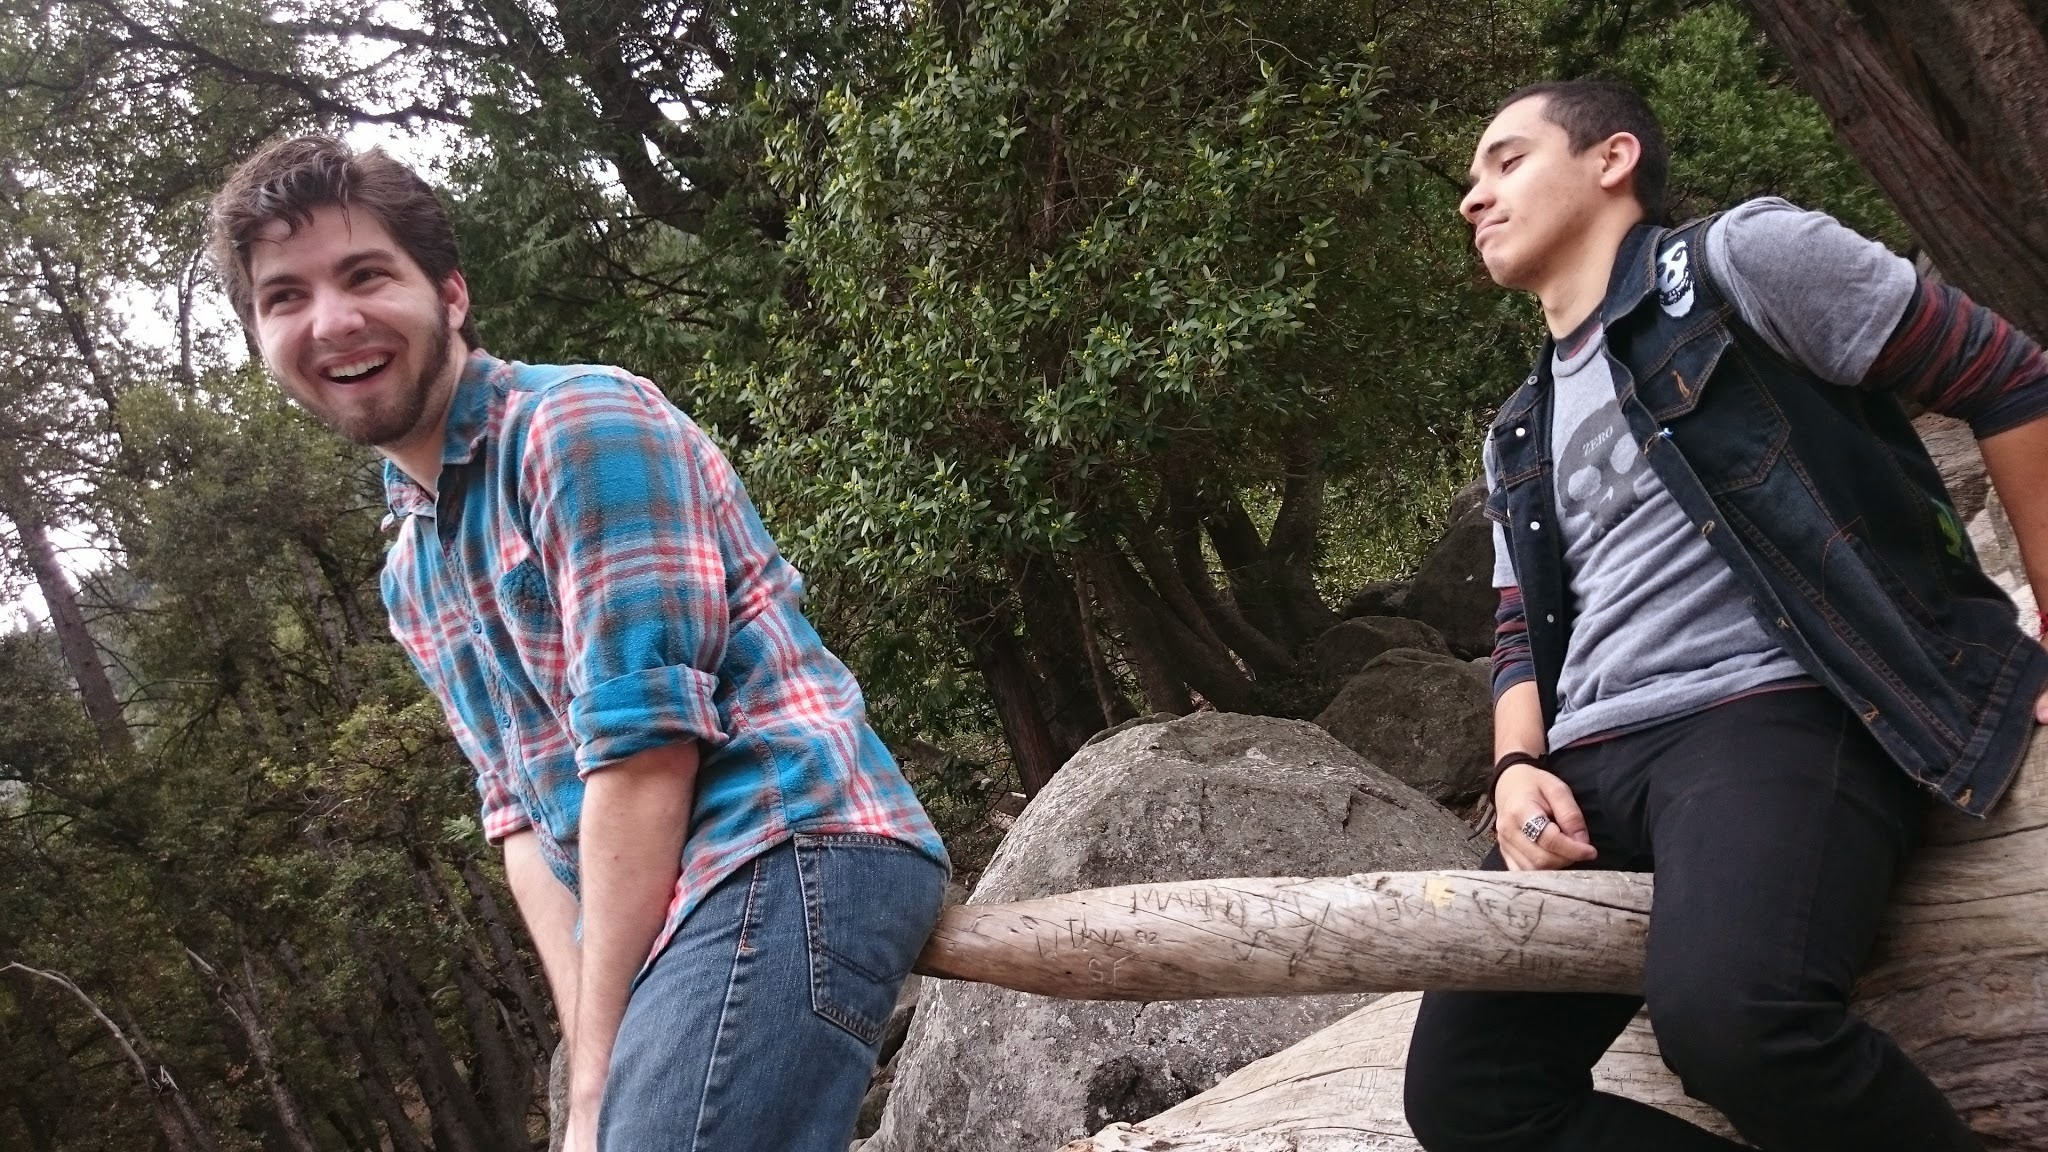 Antonio Carrasco (right) during a recent trip to poundtown.